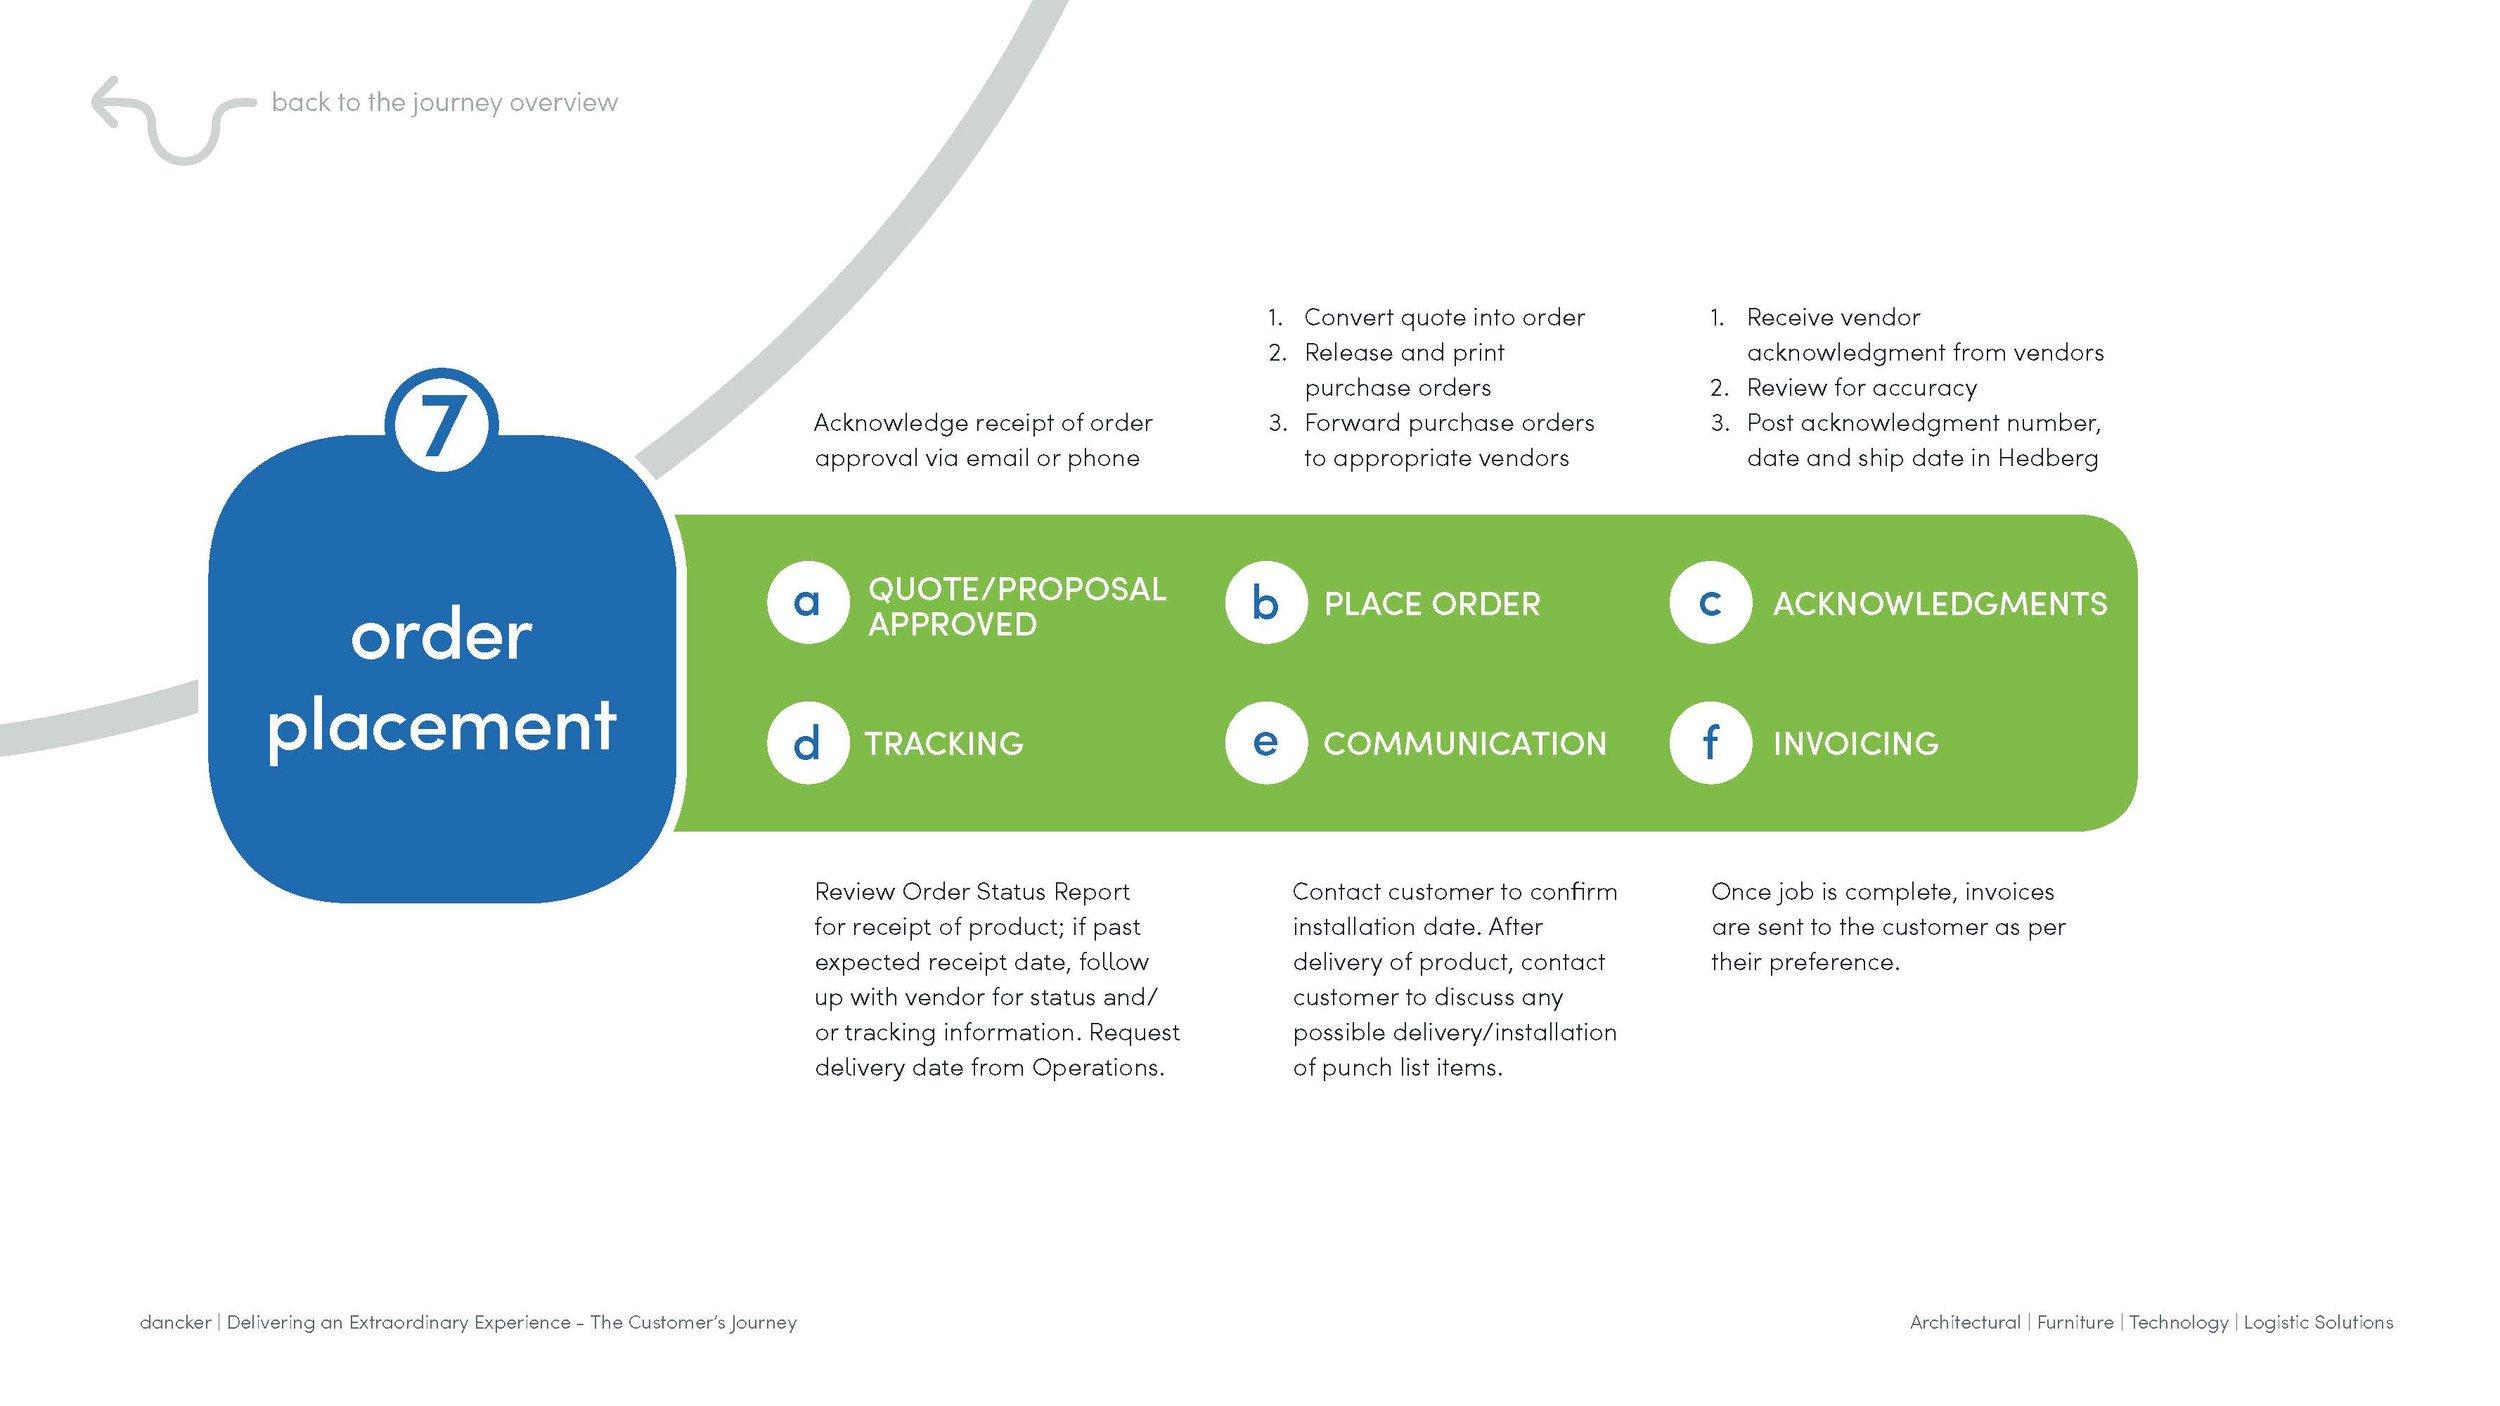 dancker_Customer Journey_Interactive Process_draft 3_Page_31.jpg